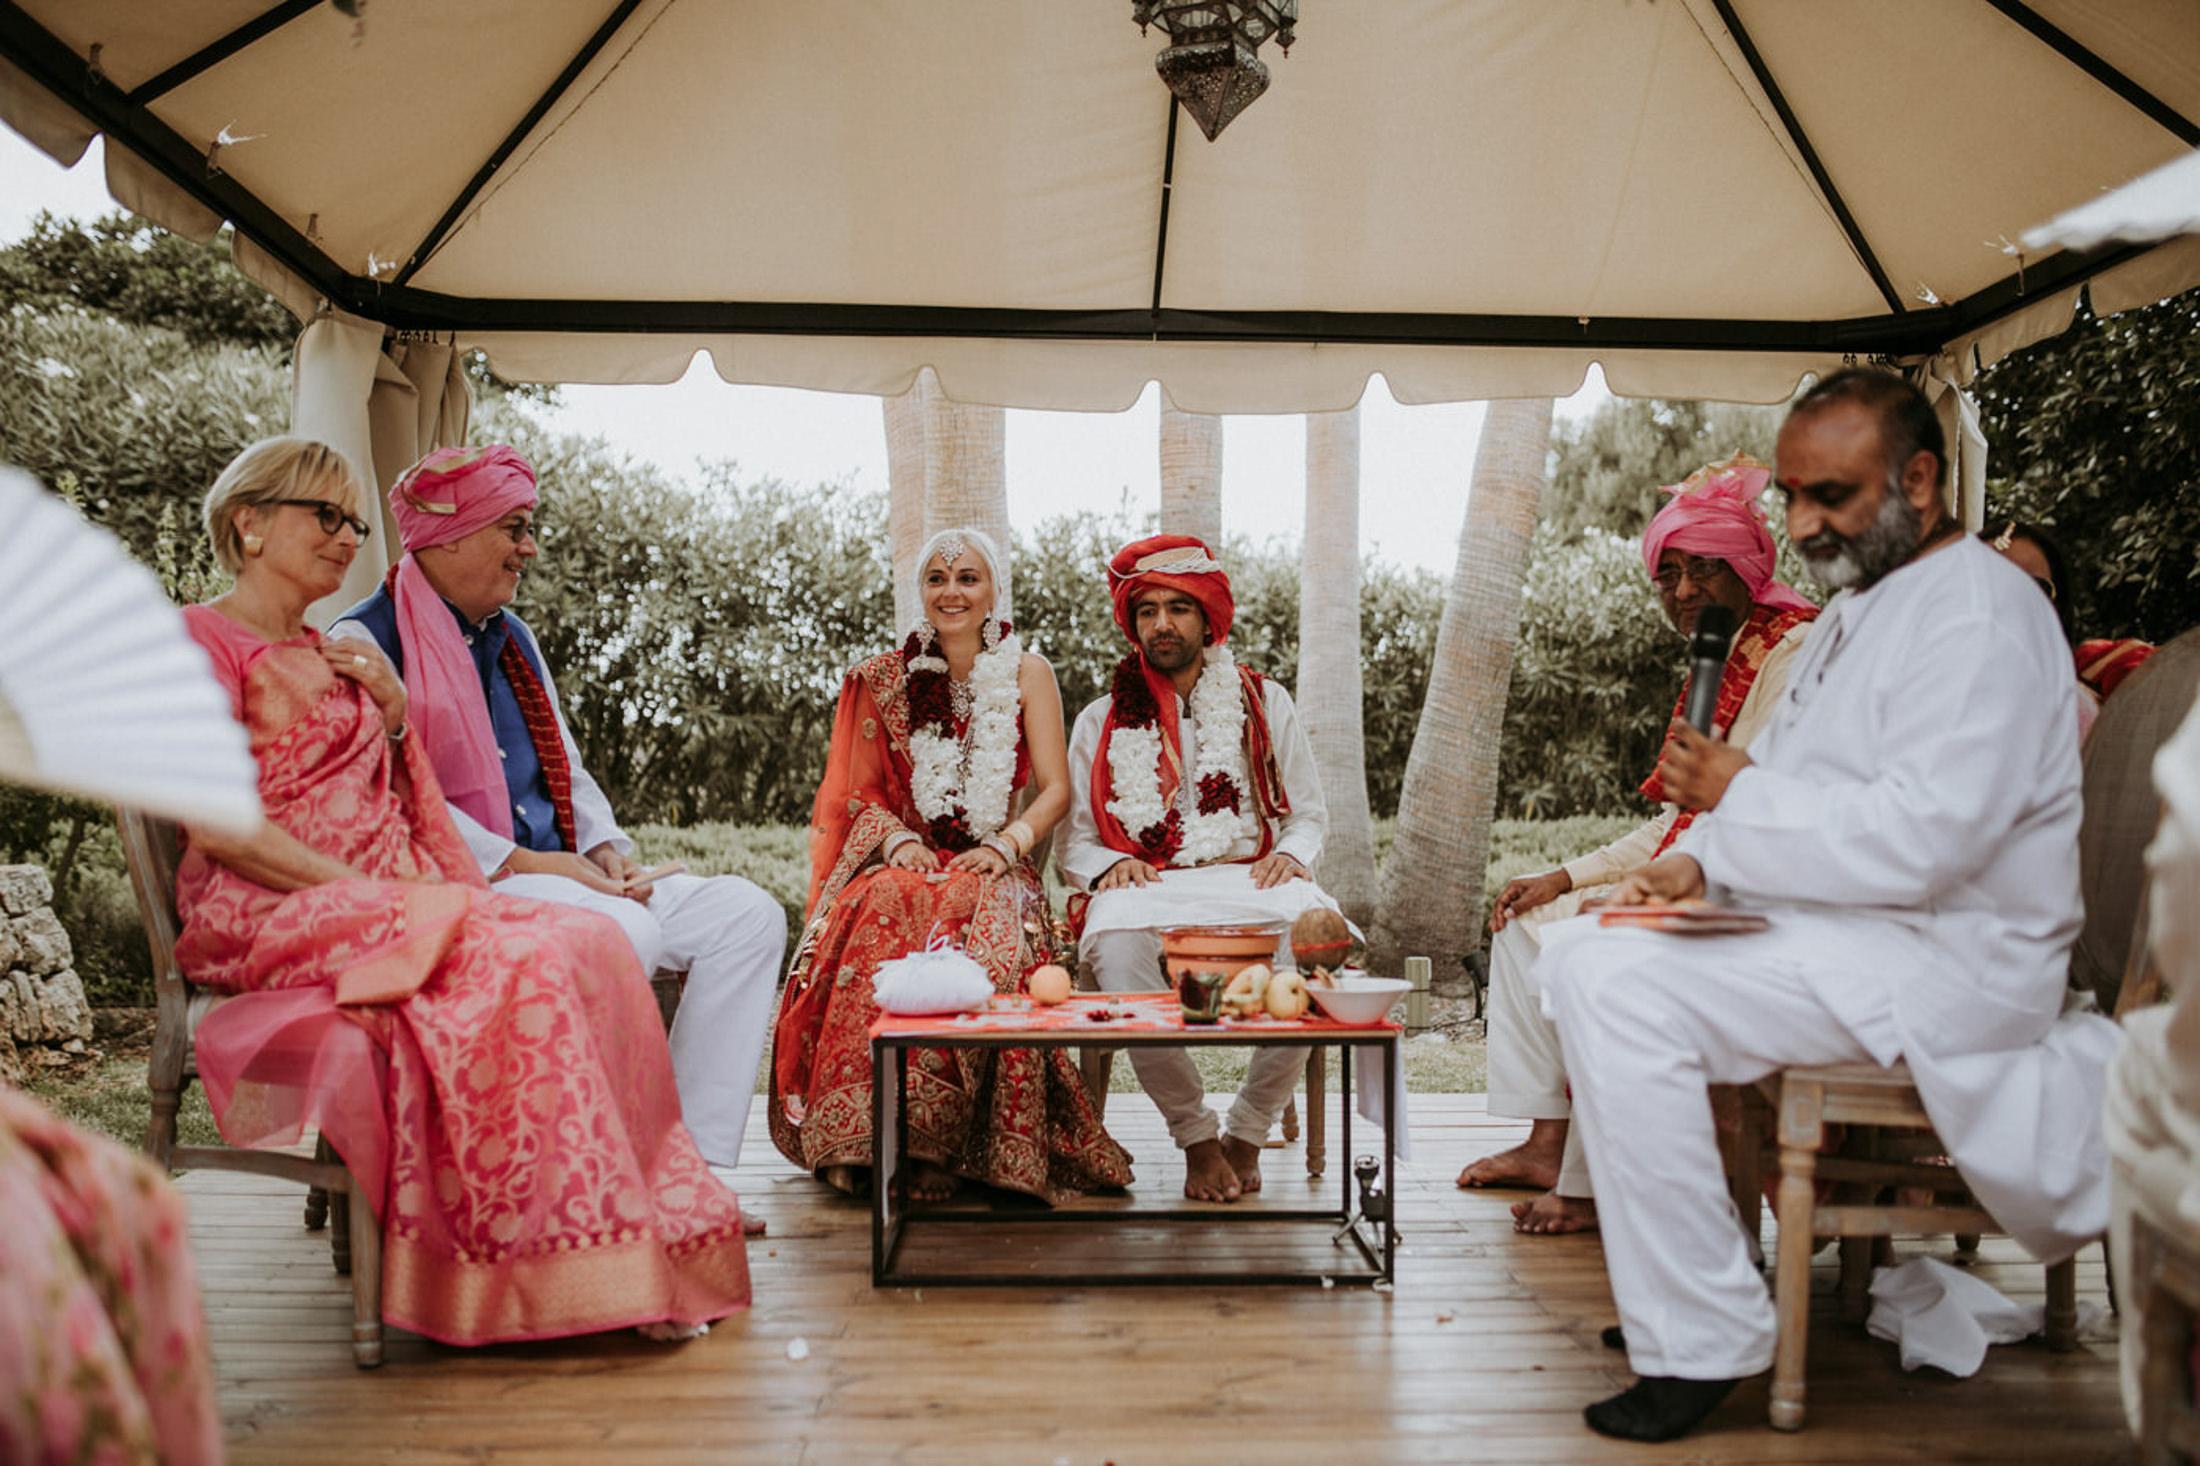 Wedding_Photographer_Mallorca_Daniela-Marquardt_Photography_New_York_Iceland_Tuscany_Santorini_Portugal_Austria_Bavaria_Elopement_Hochzeitsfotograf_AntjeRajat2_46